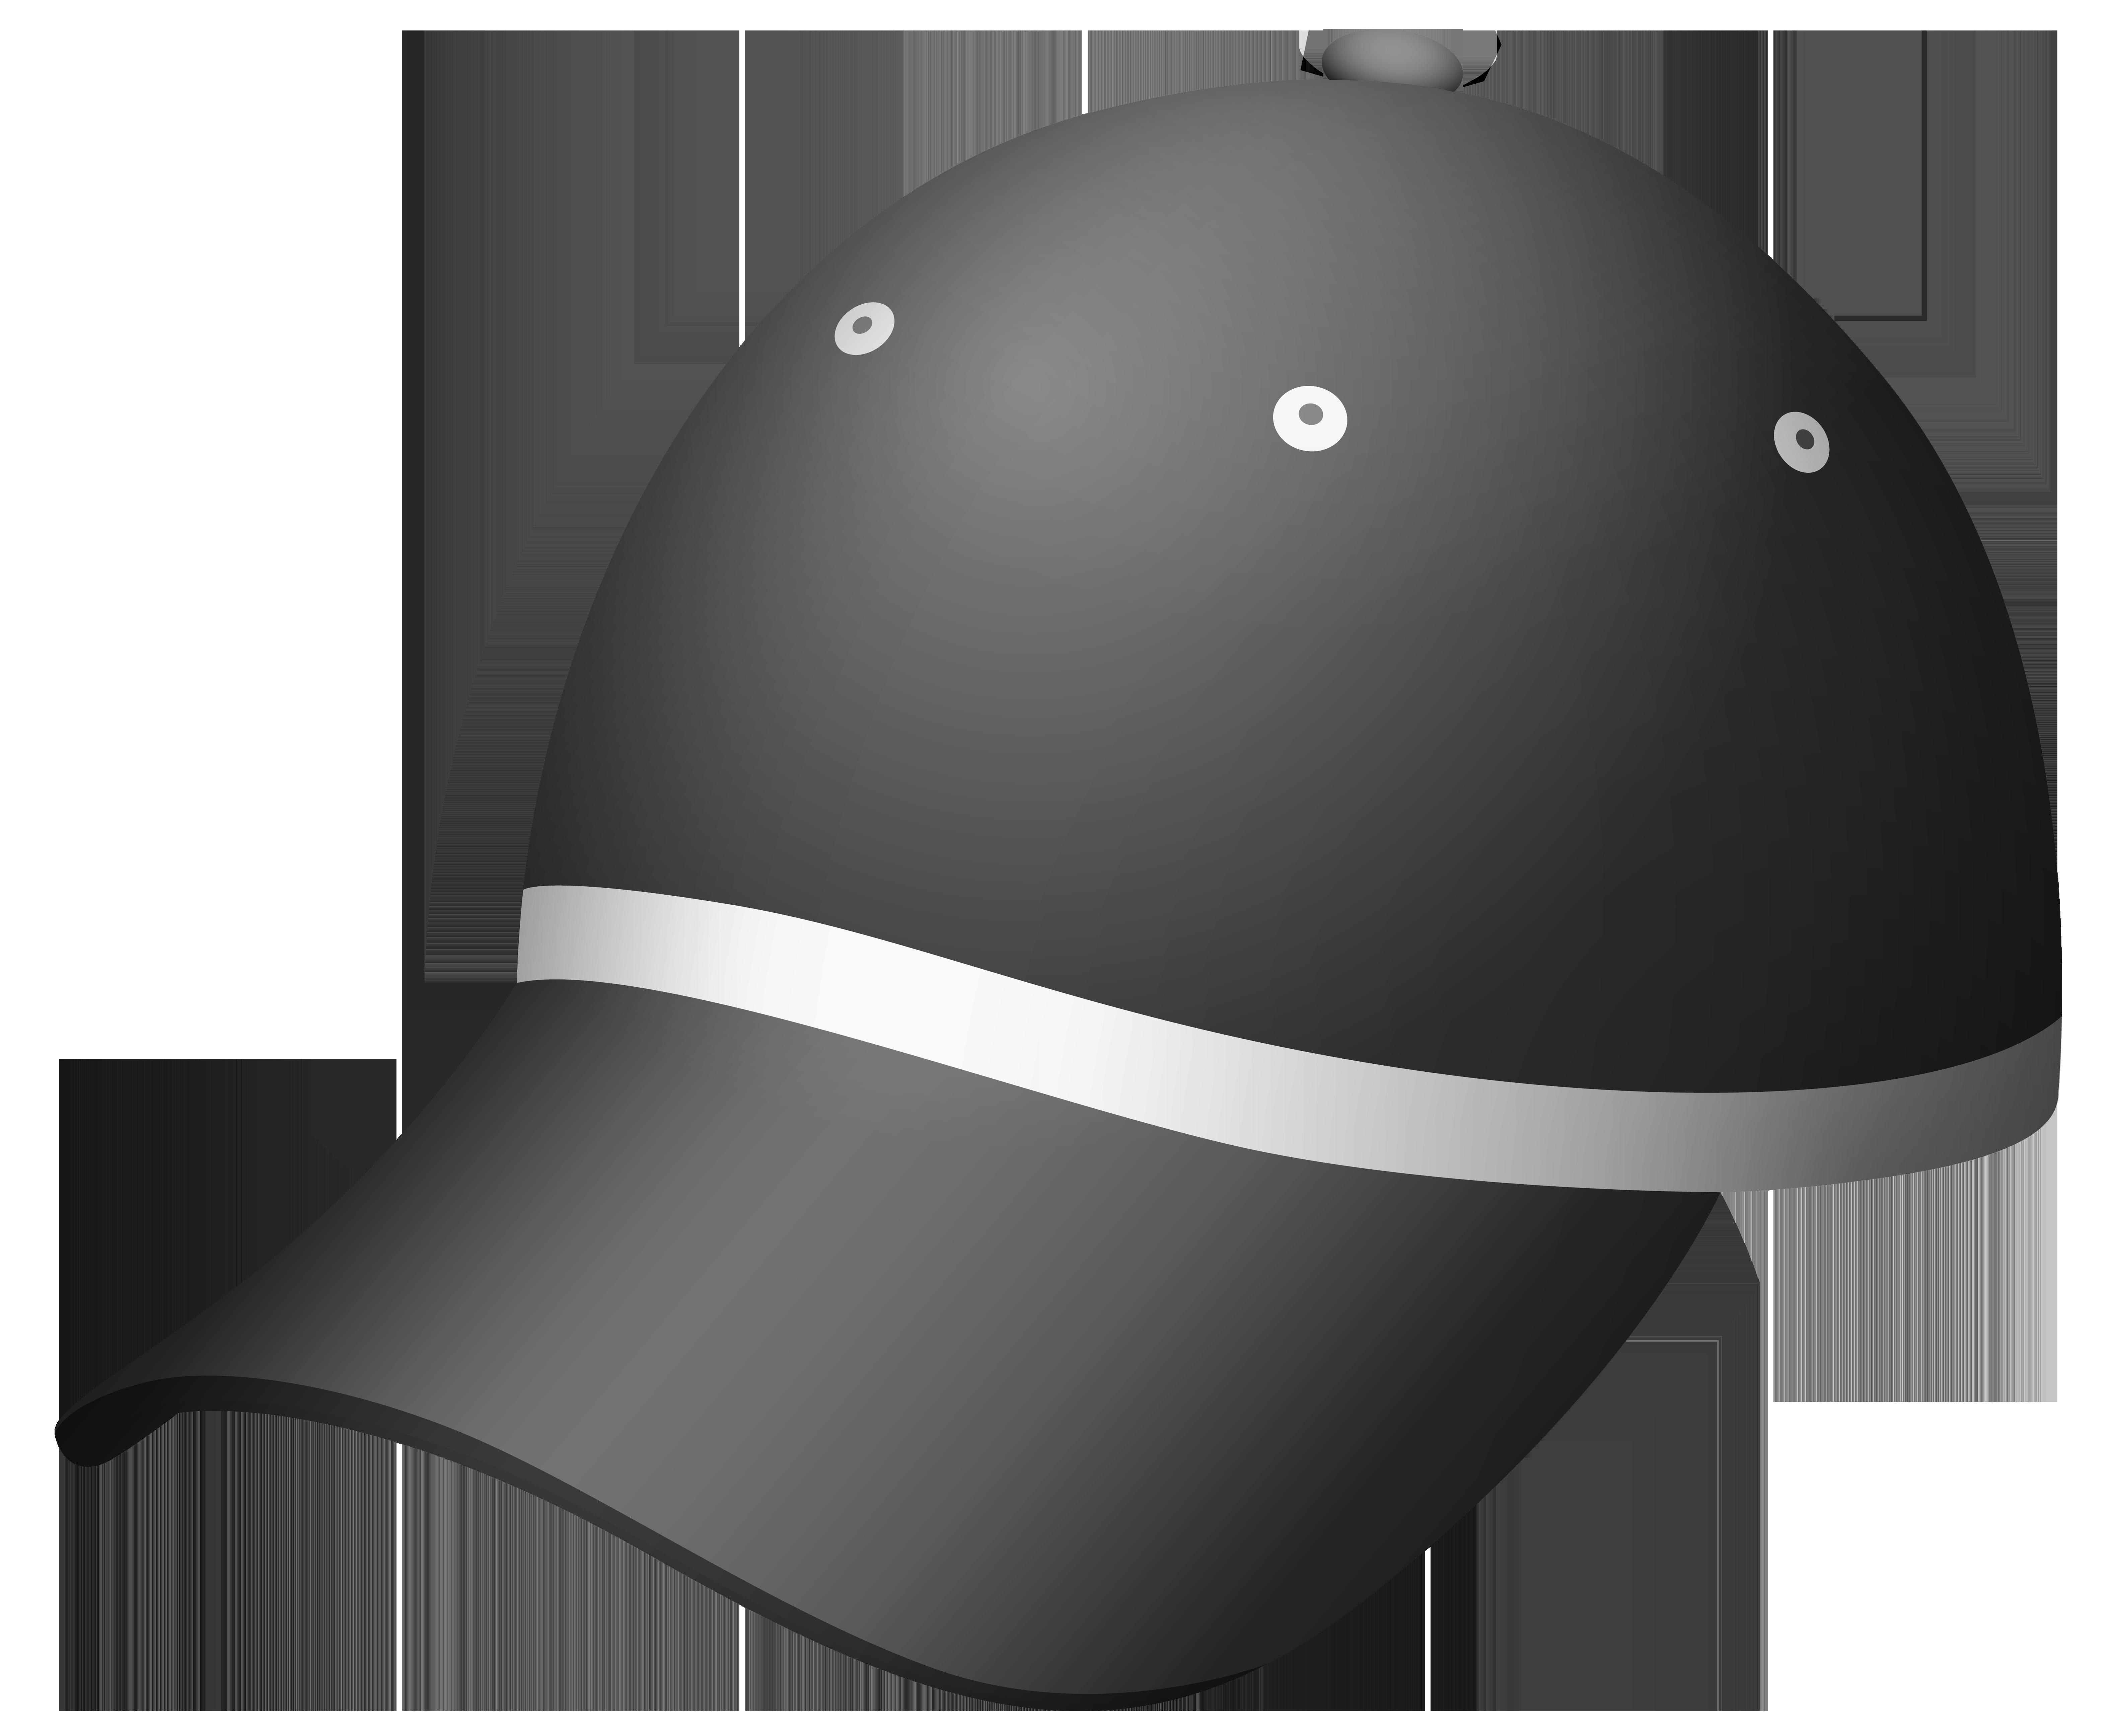 Dark Gray Cap PNG Clipart.